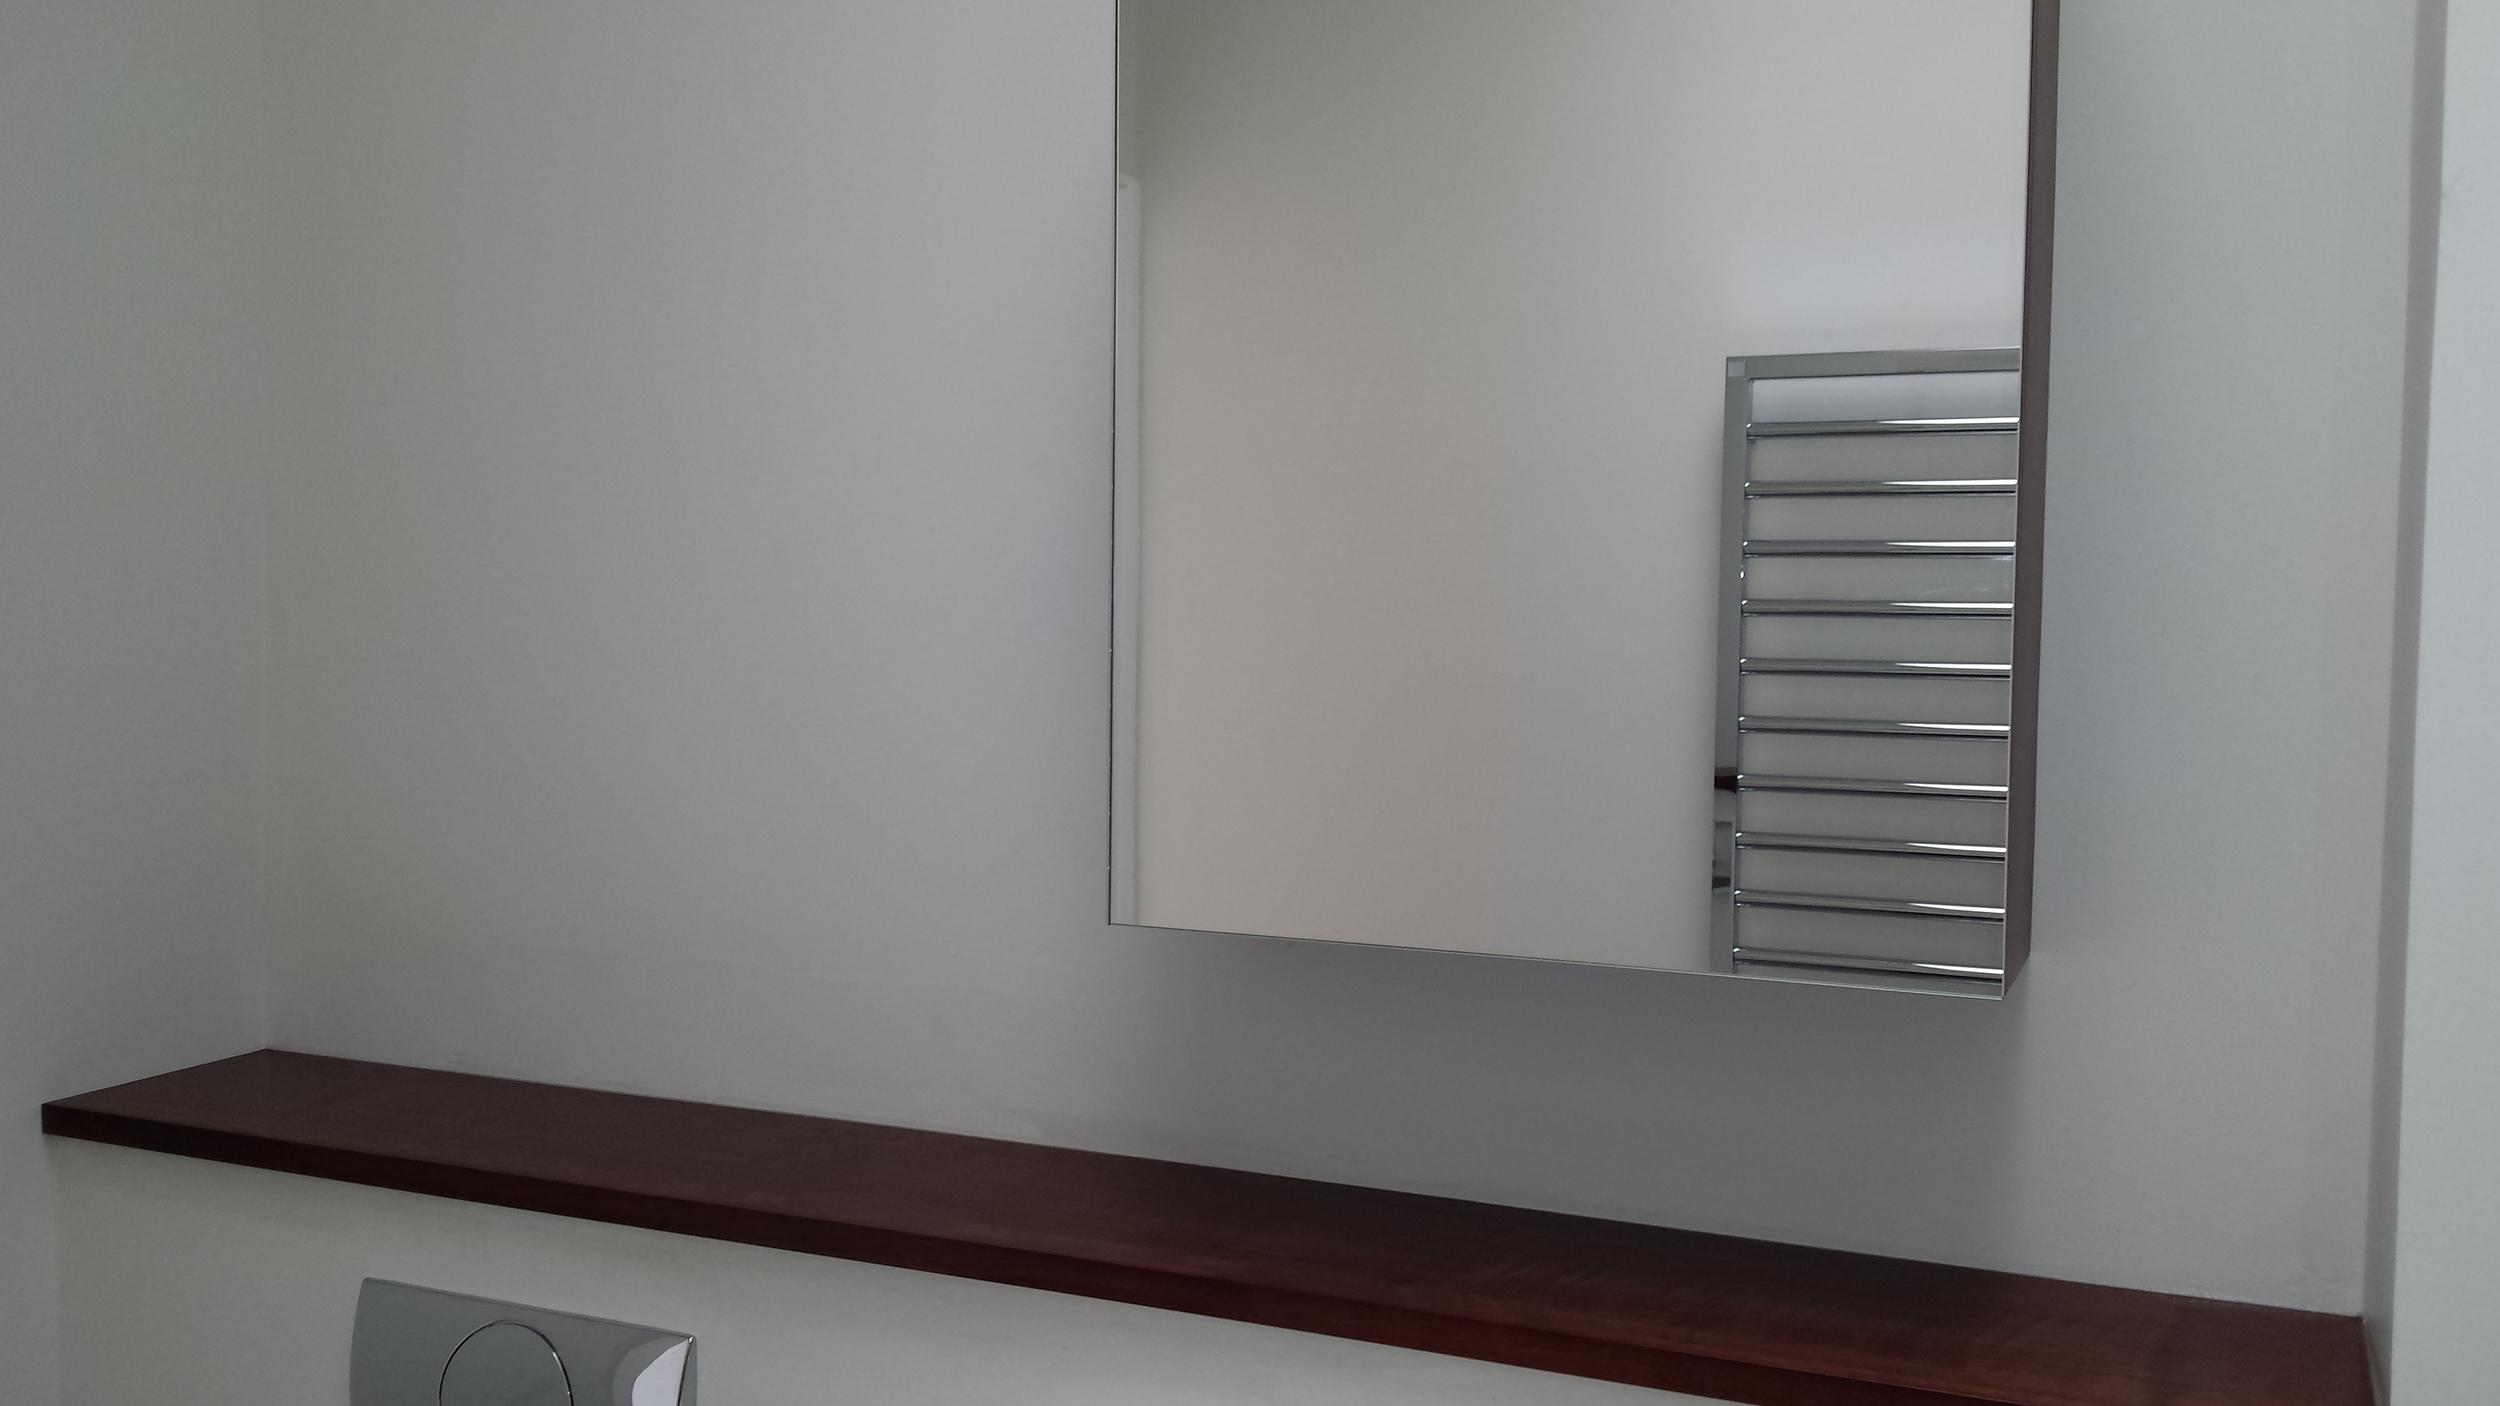 Shelf & bathroom cabinet